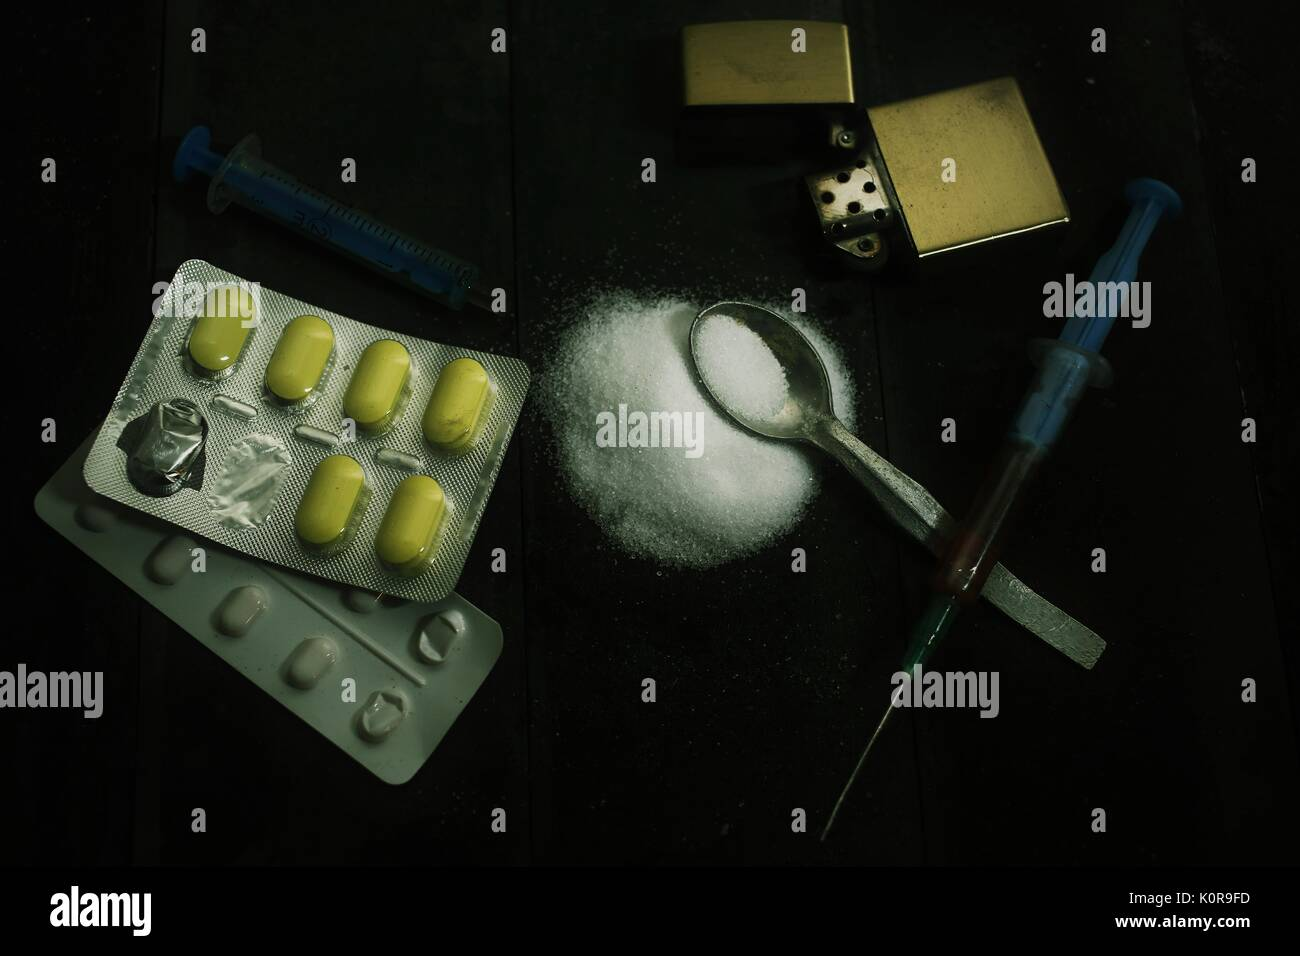 Hard drugs on dark table. A dark theme, drug use. Preparation of drugs, still life. Syringe with needle, spoon, tablets, lighter. Death. - Stock Image